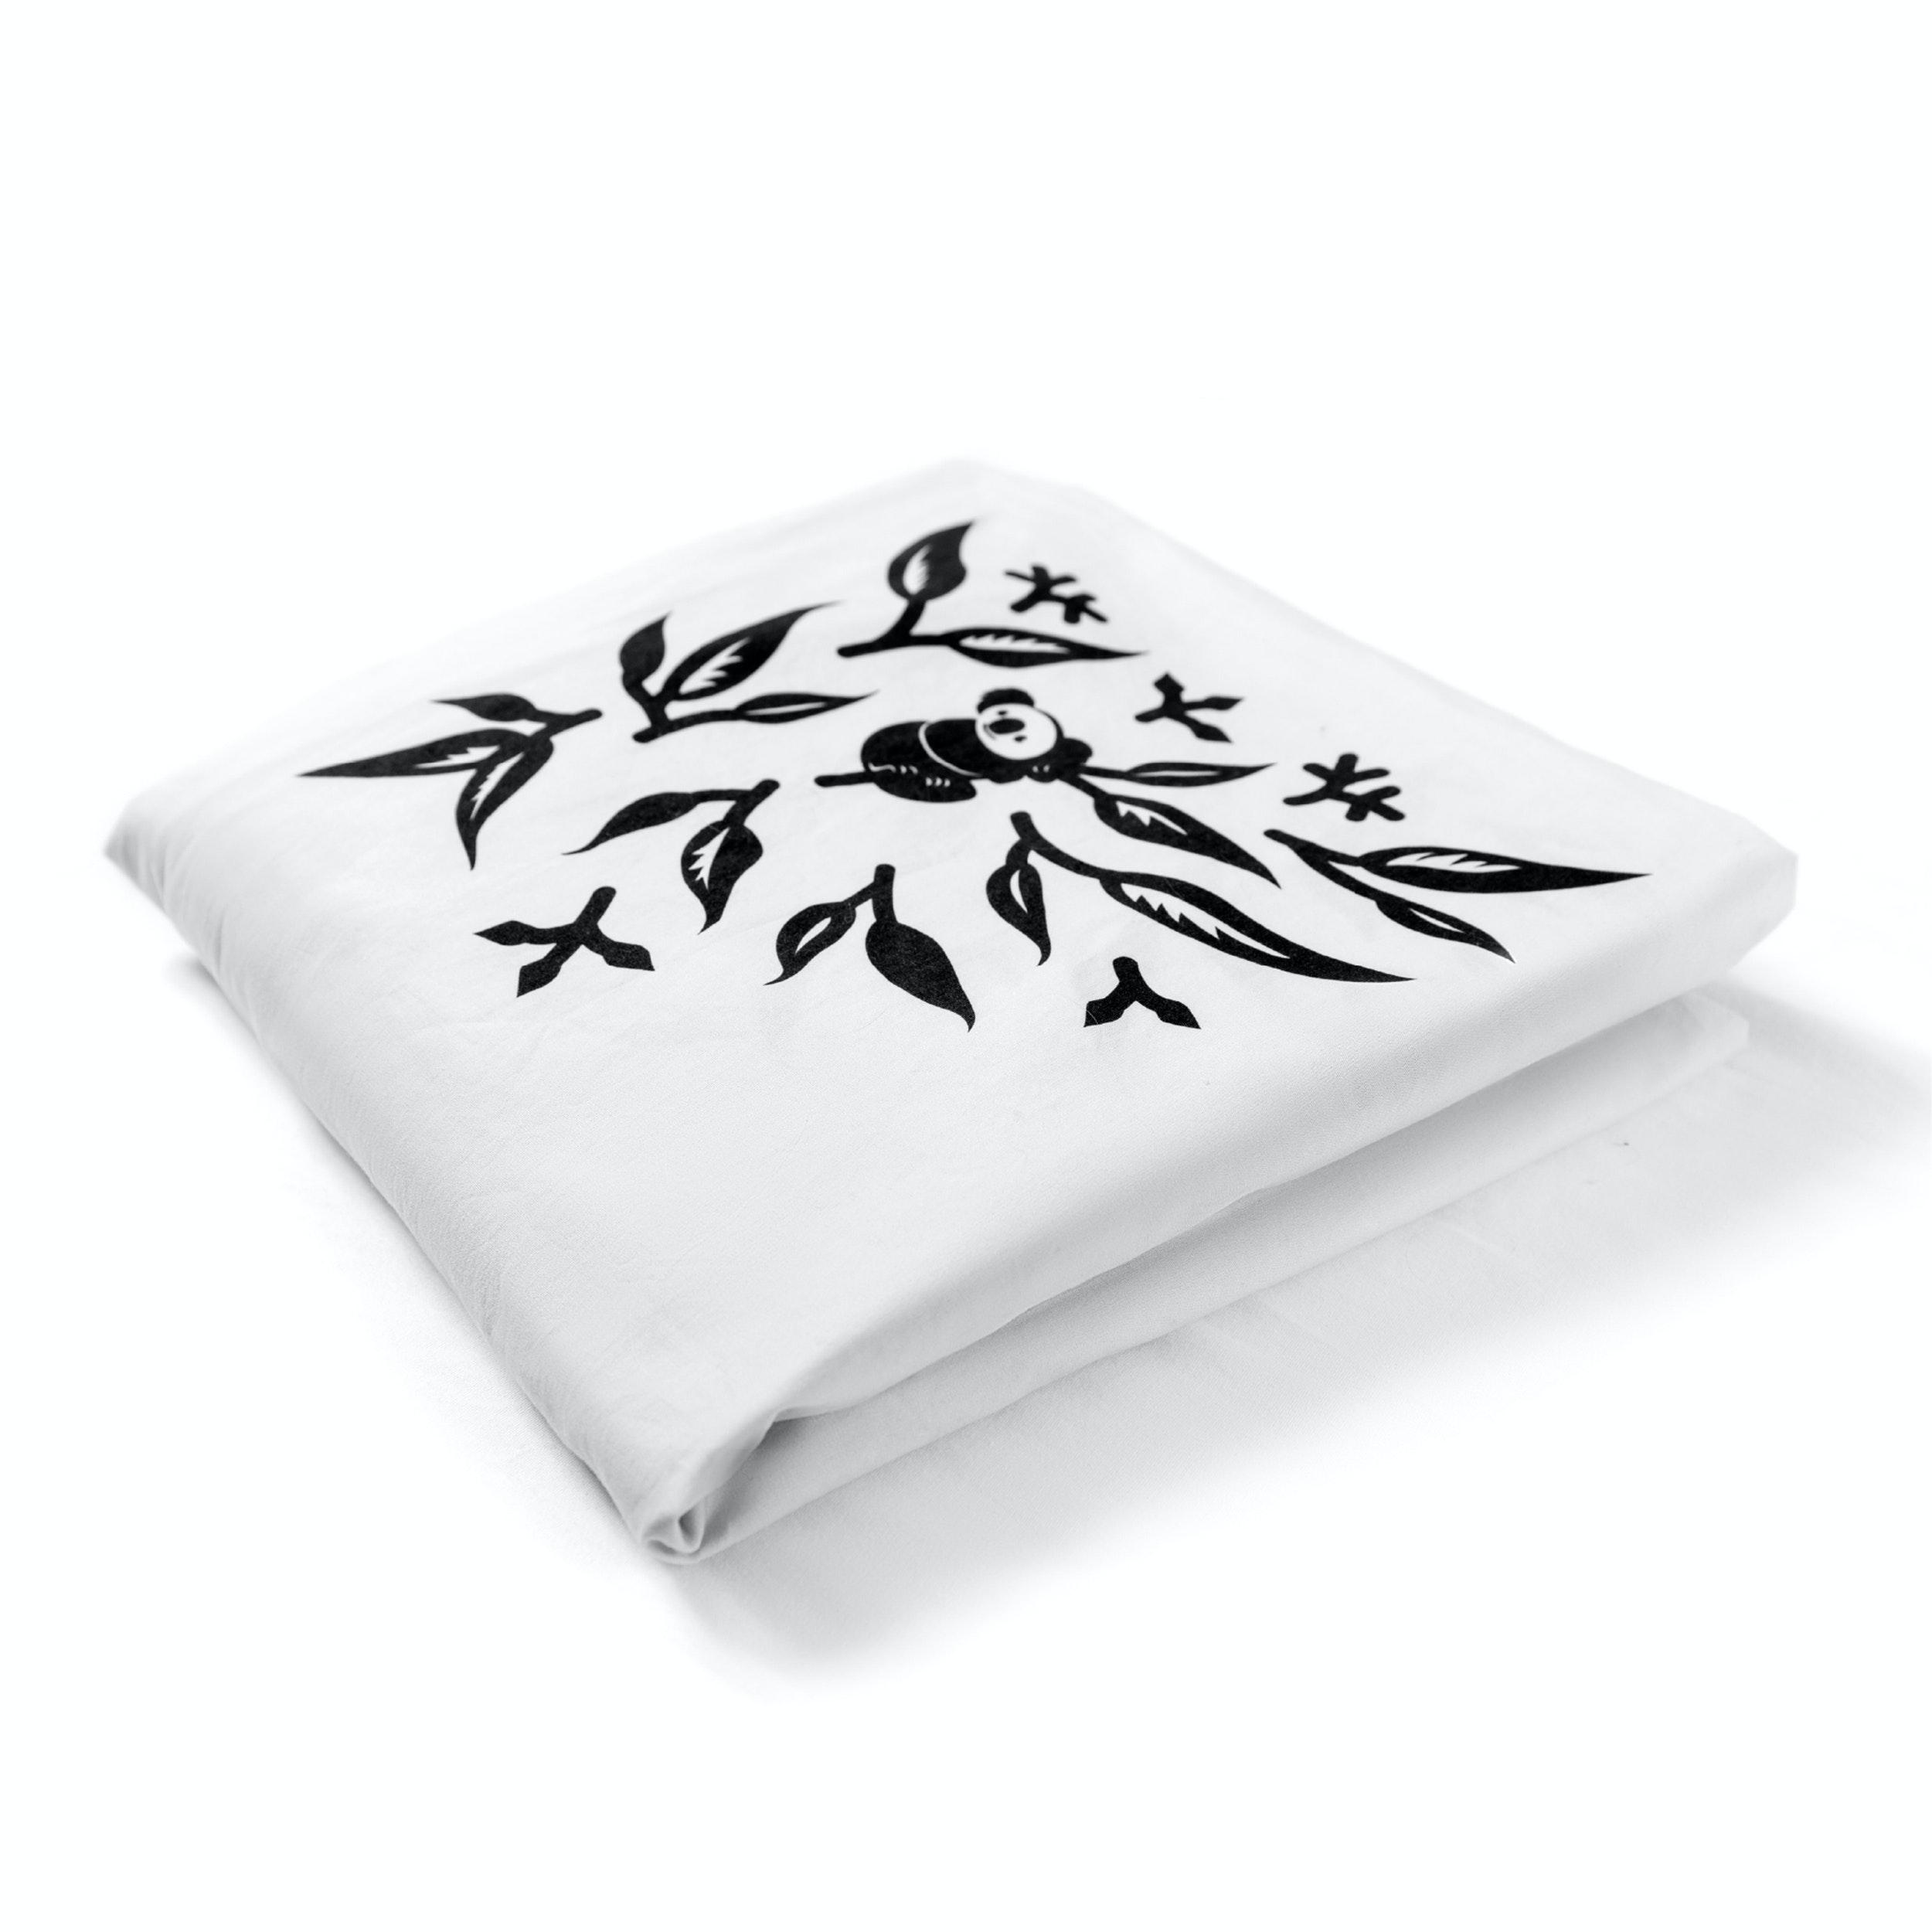 Sheets06 White